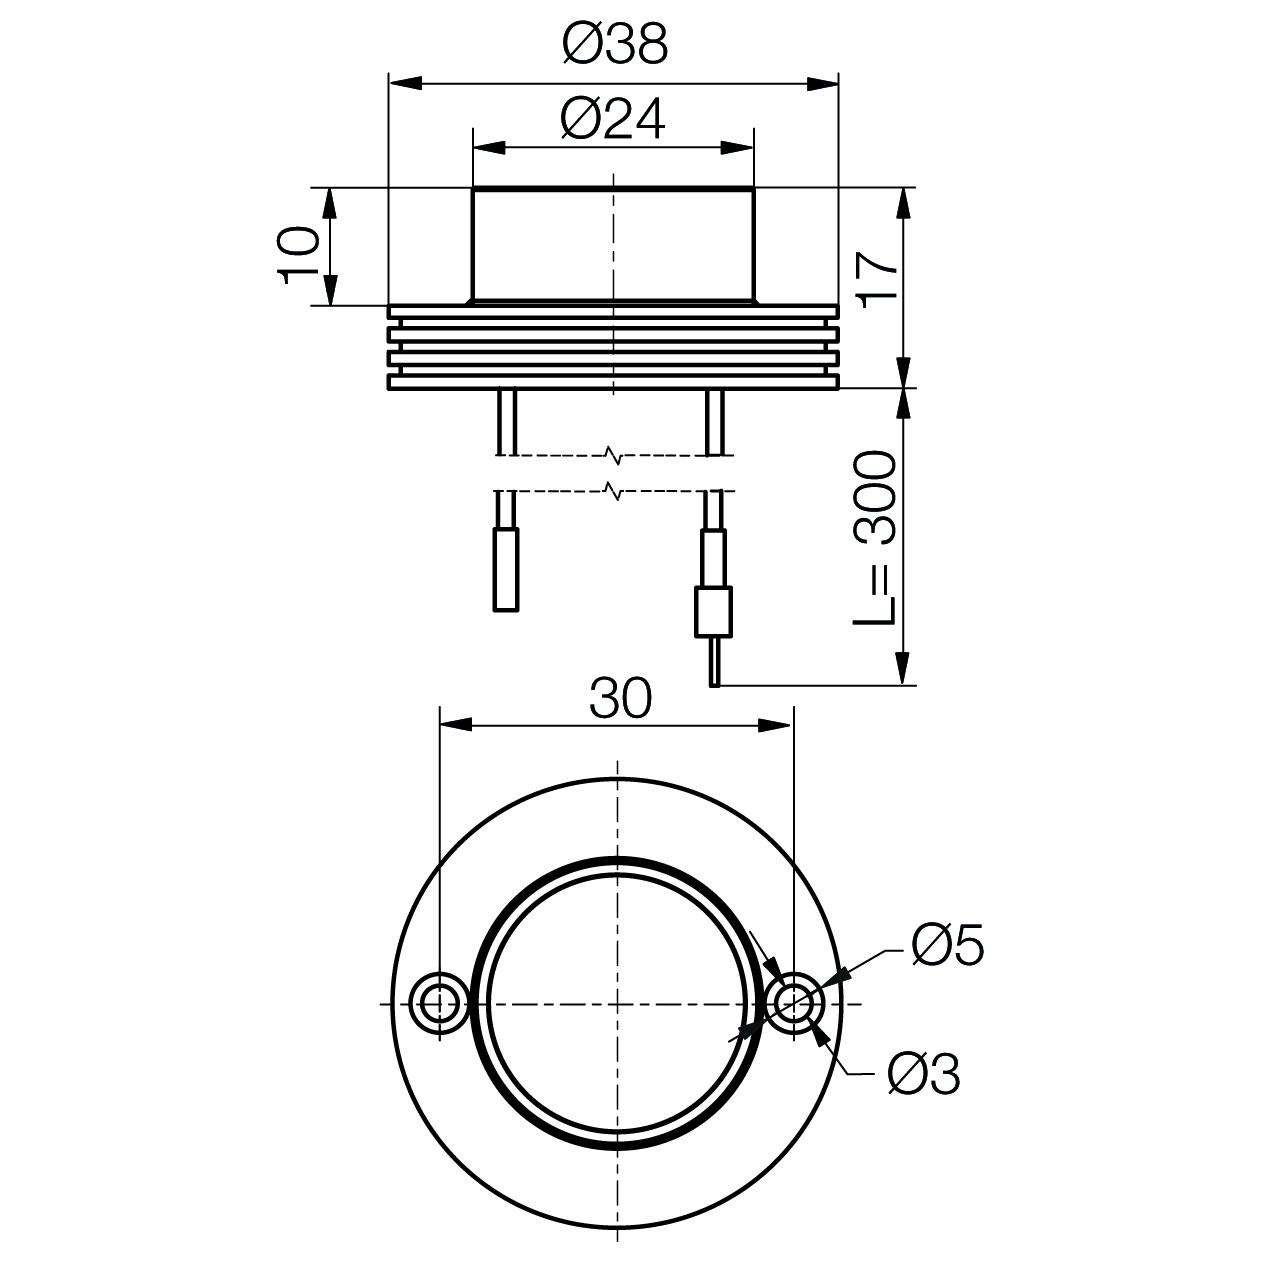 Power-LED-Modul MinoStar - plan